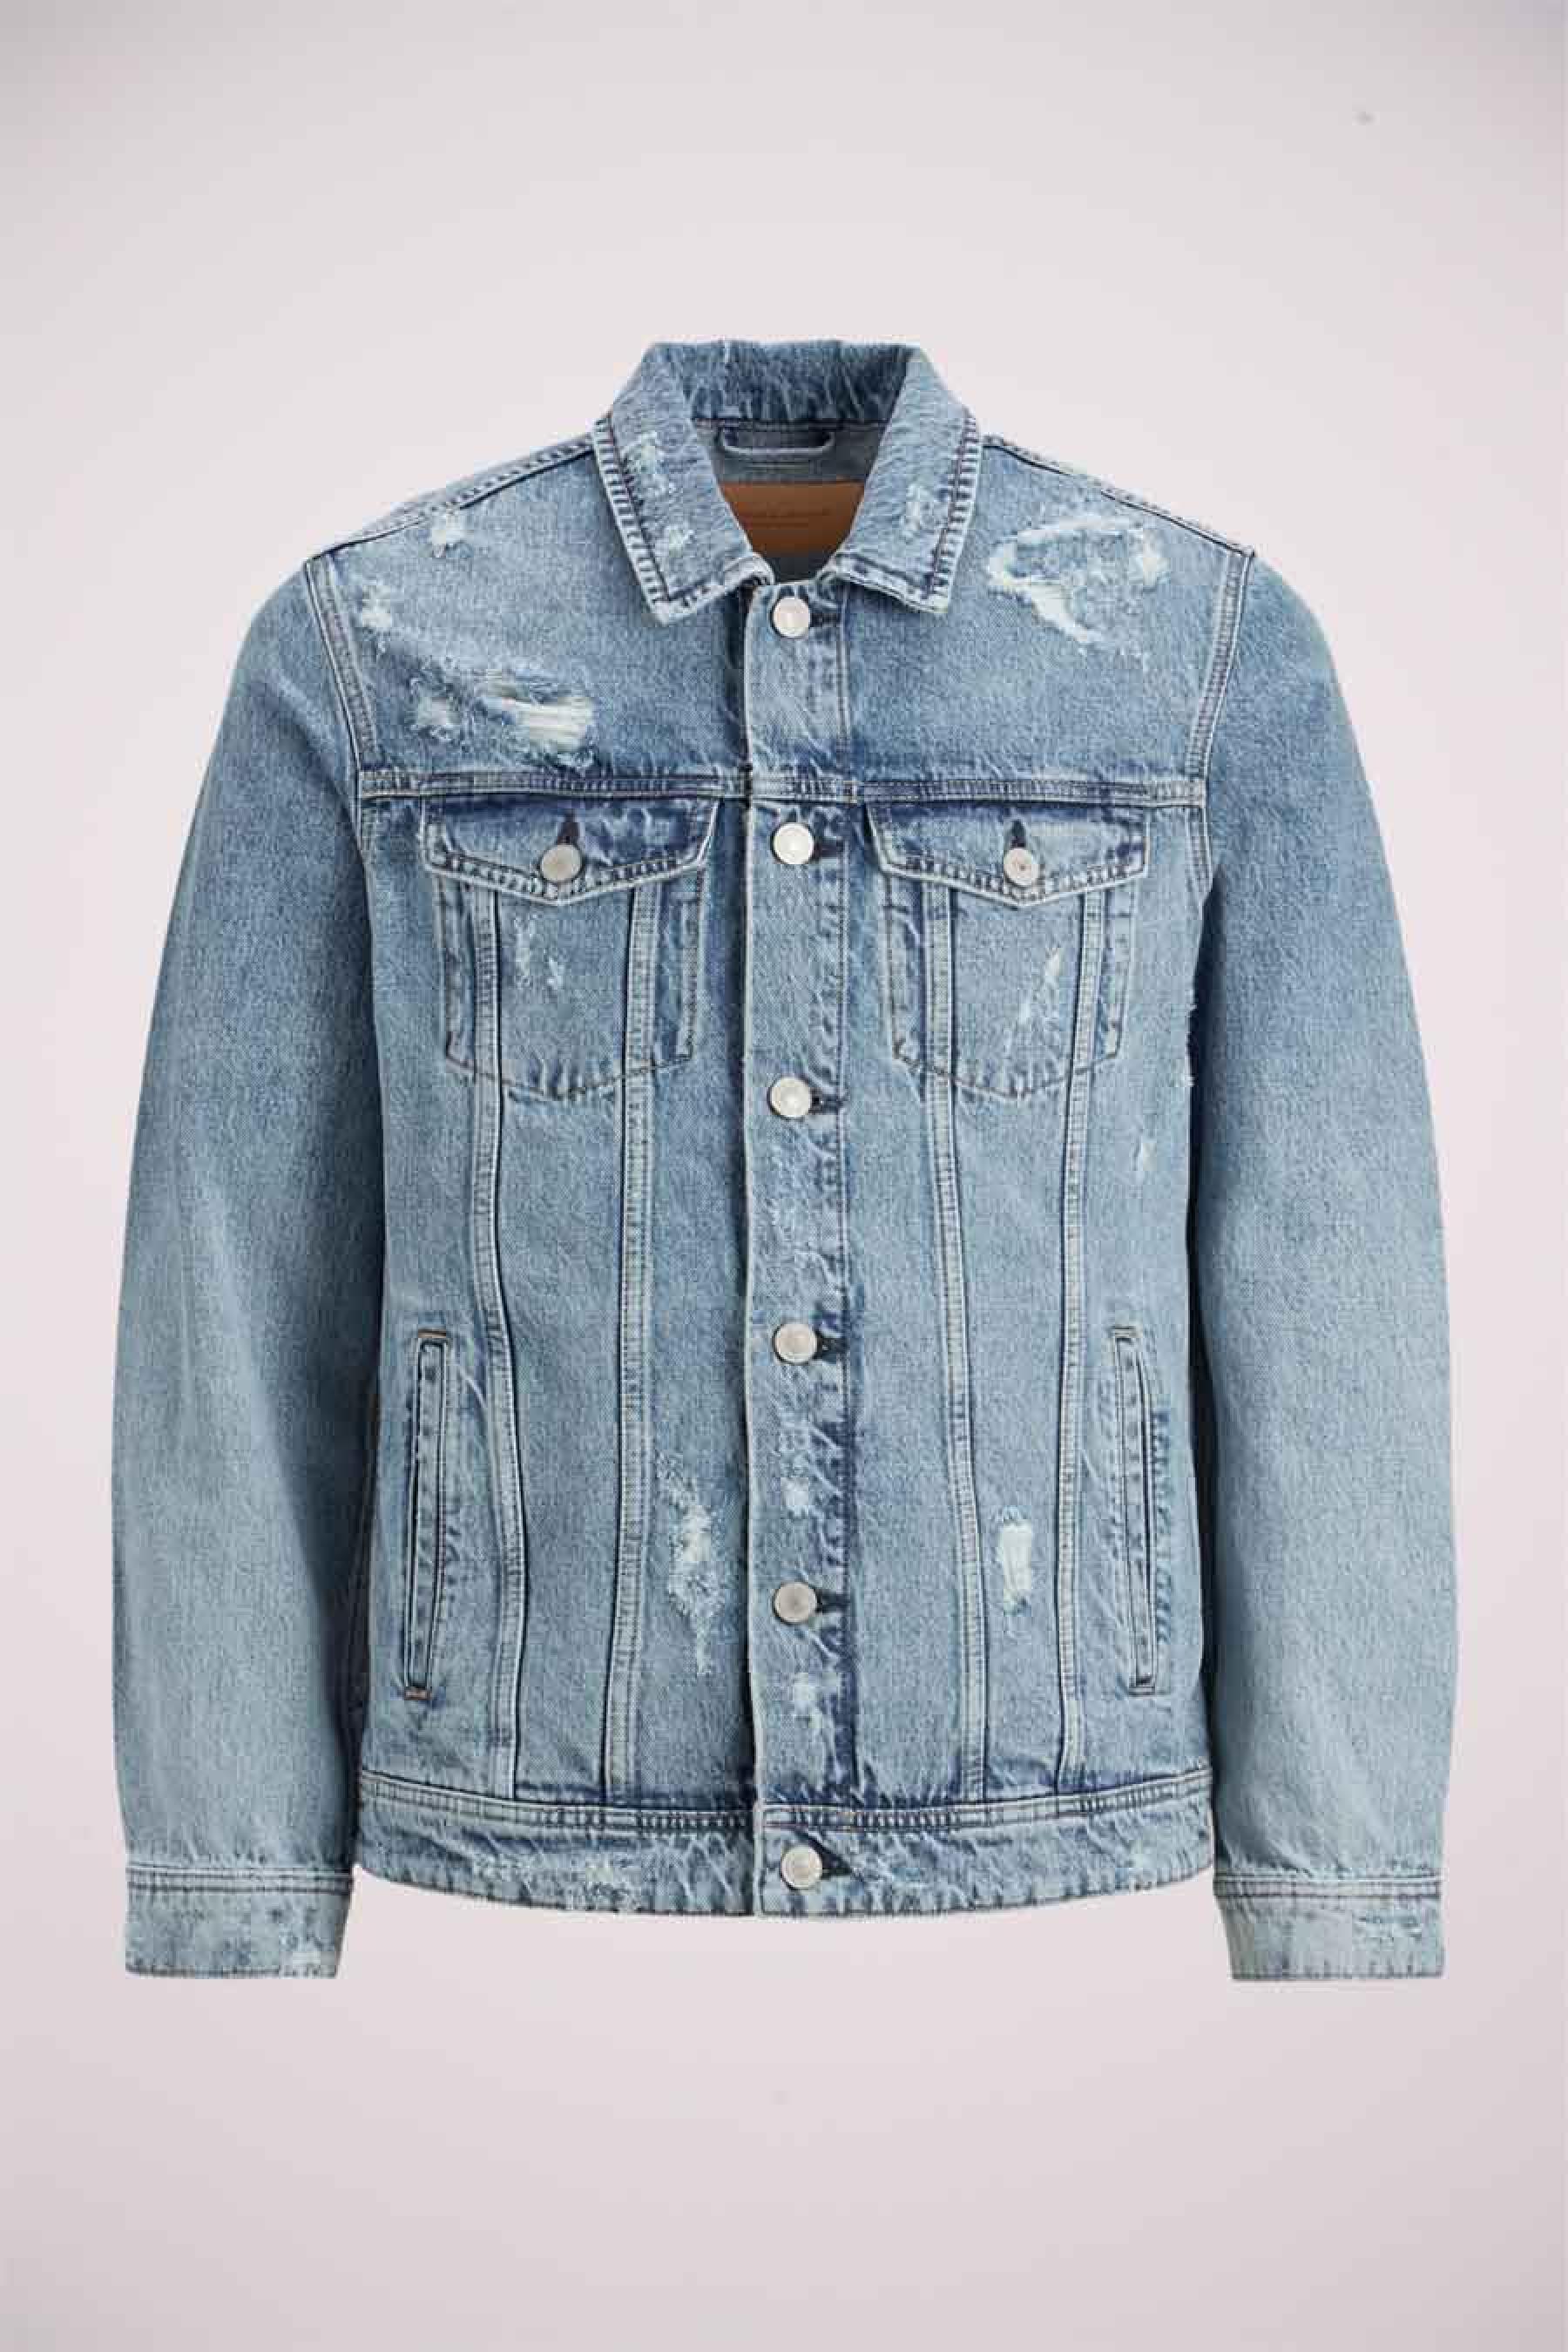 Jack & Jones Jeans Intelligenc Jas jeans, Denim, Heren, Maat: L/M/S/XL